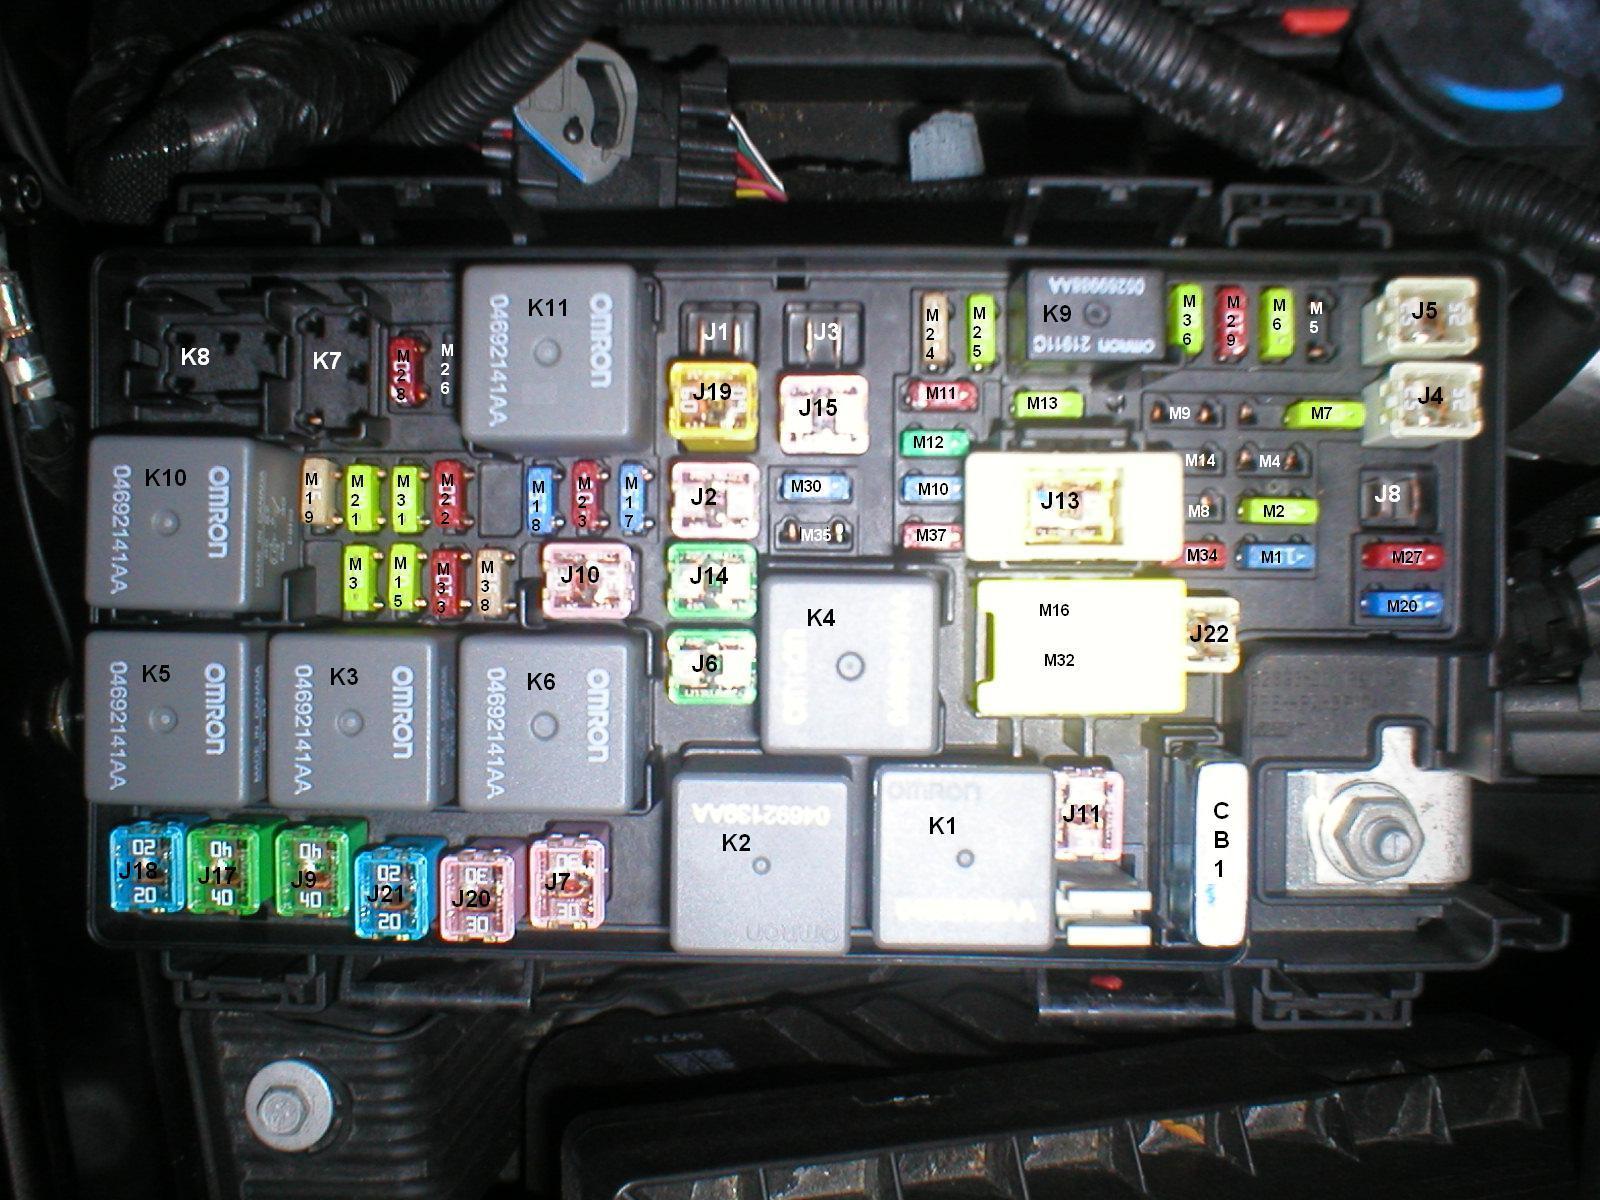 JKFuseBox2009?resize=618%2C464 2008 jeep patriot interior fuse box location brokeasshome com 2009 jeep patriot fuse box diagram at gsmportal.co